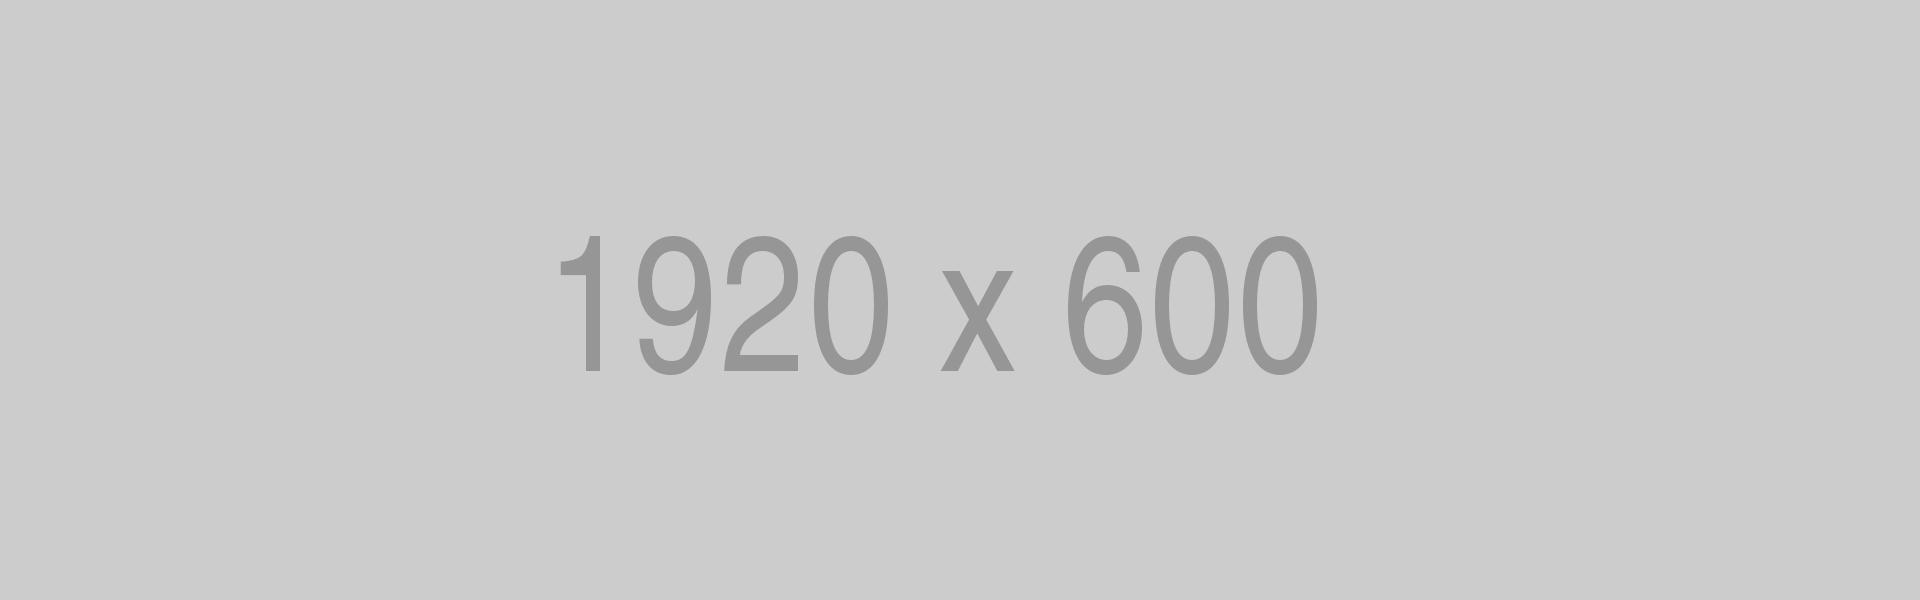 1920x600